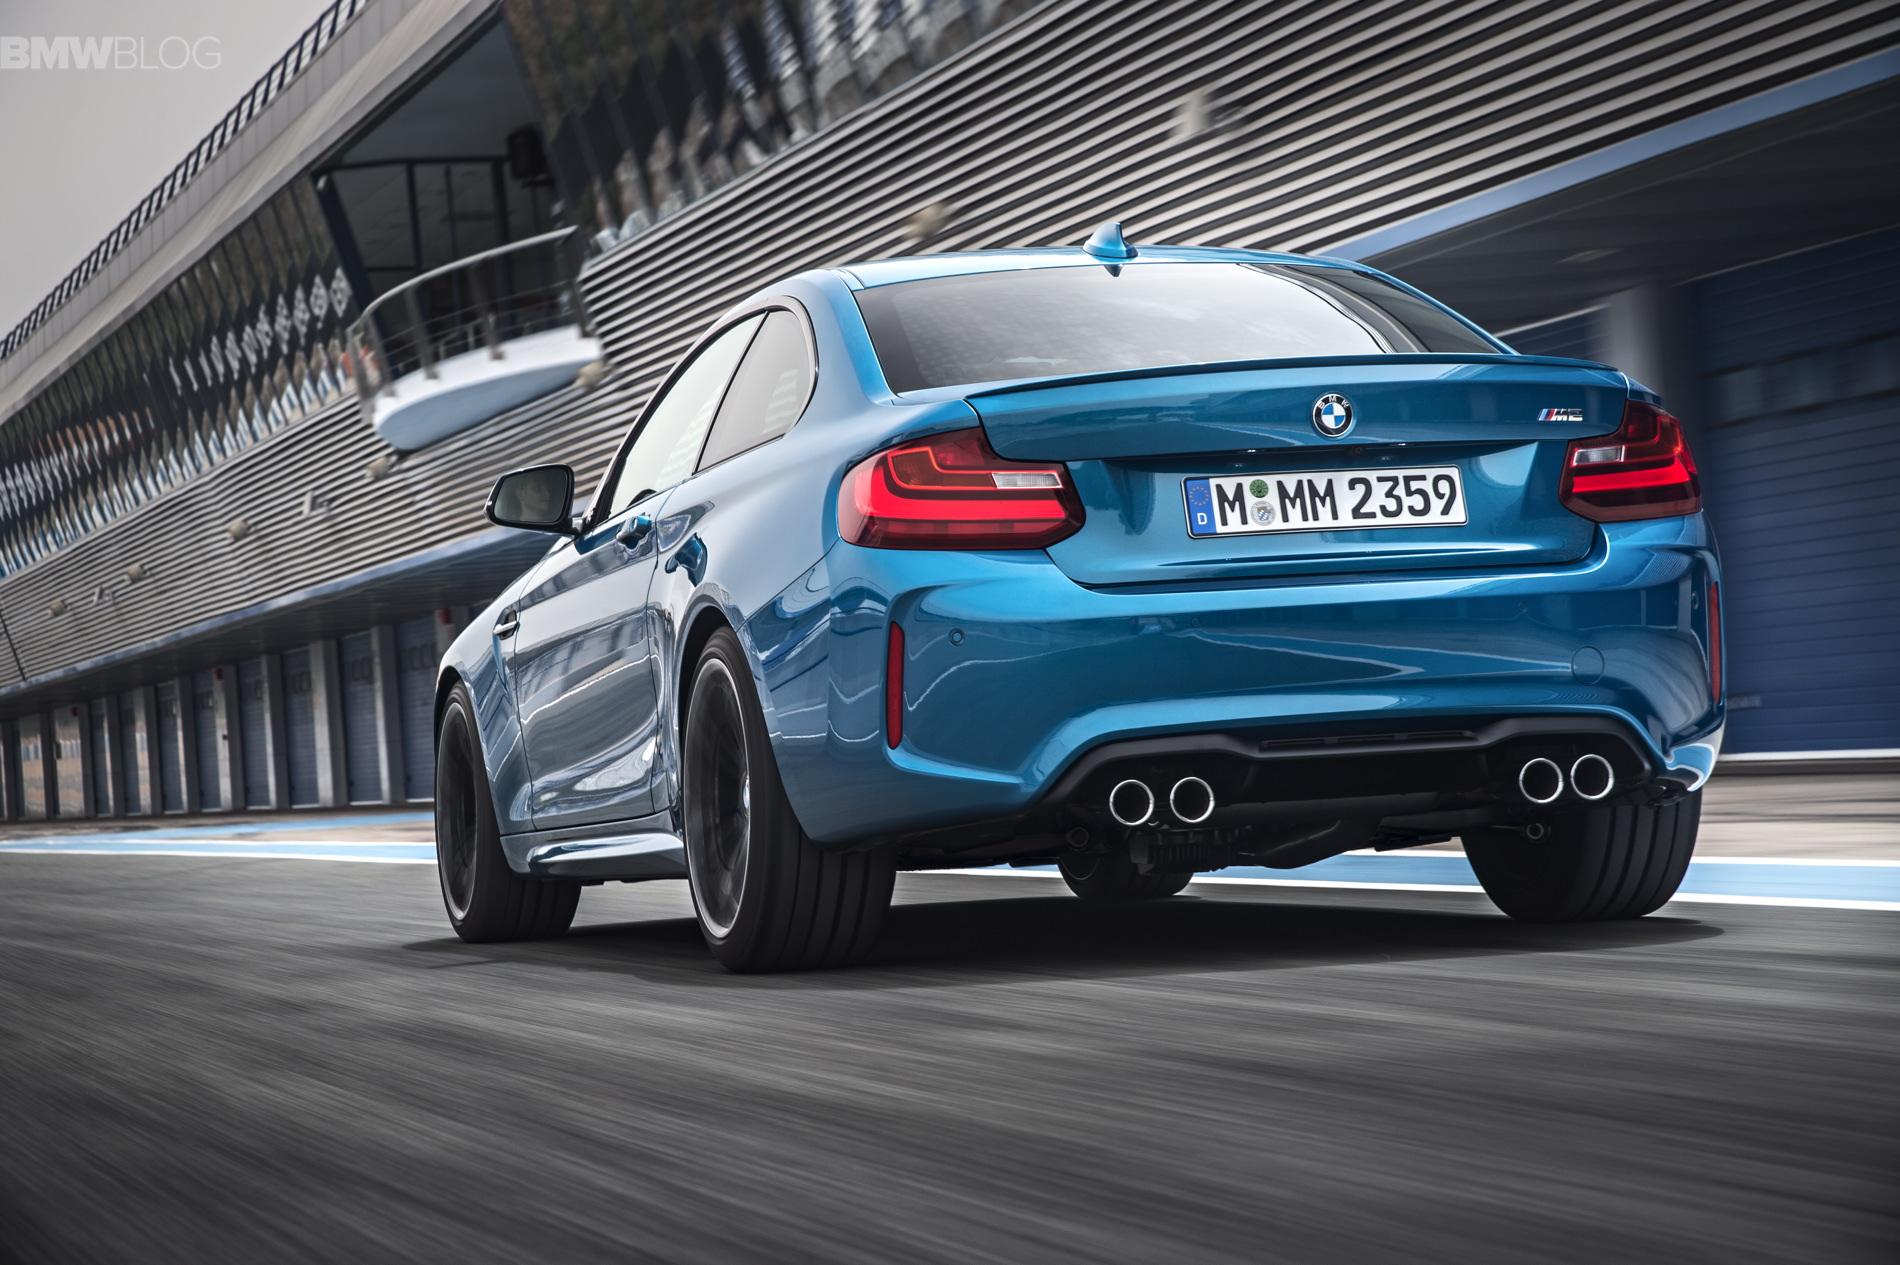 BMW M2 images 24